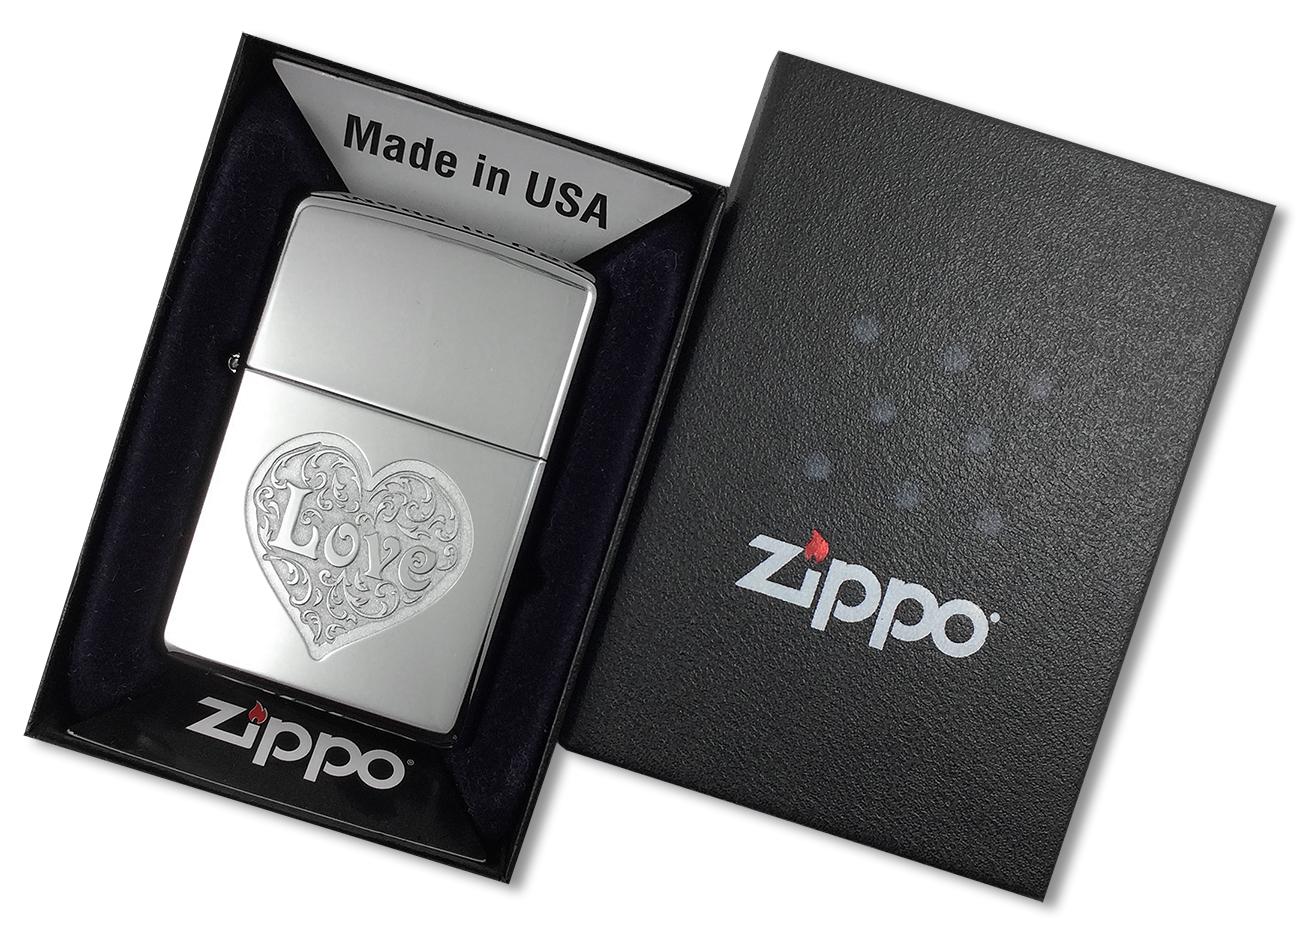 24459 Зажигалка Zippo Love, Polish Chrome - в подарочной упаковке